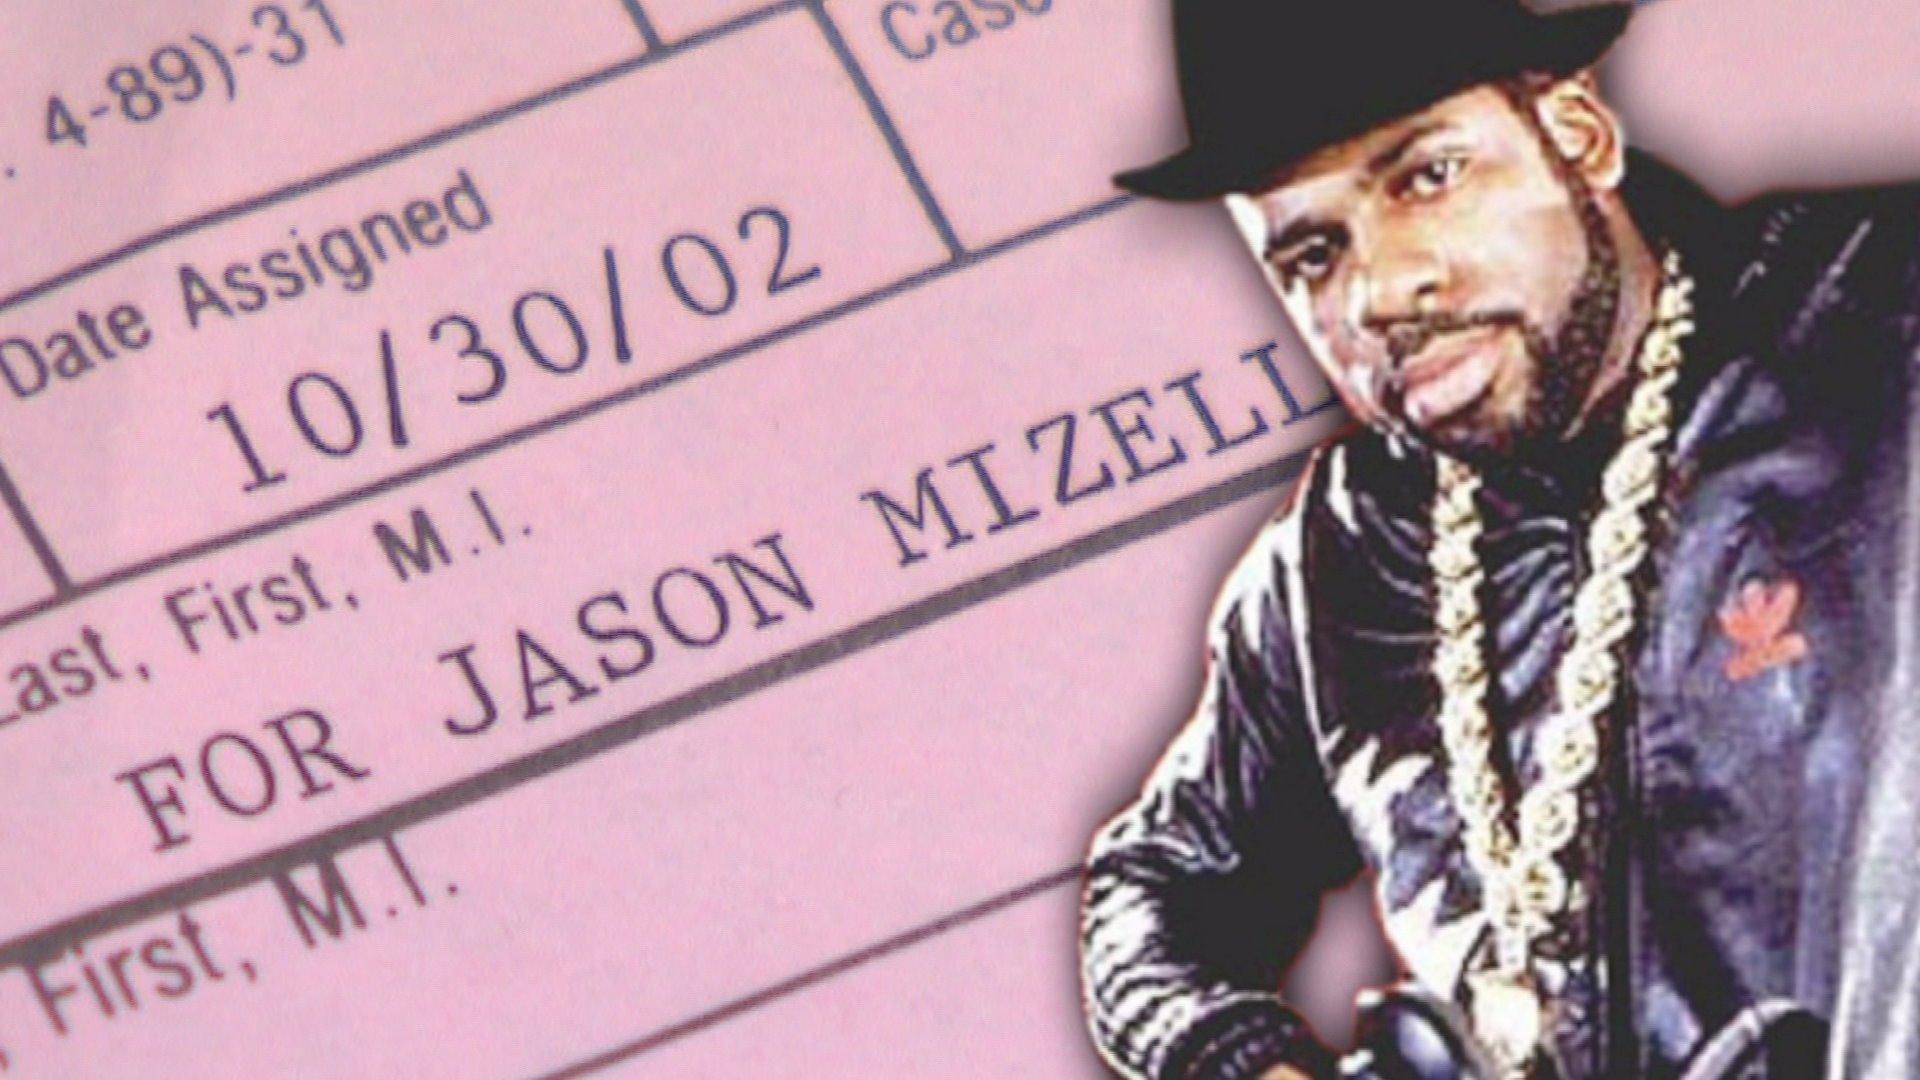 jam master jay police sheet